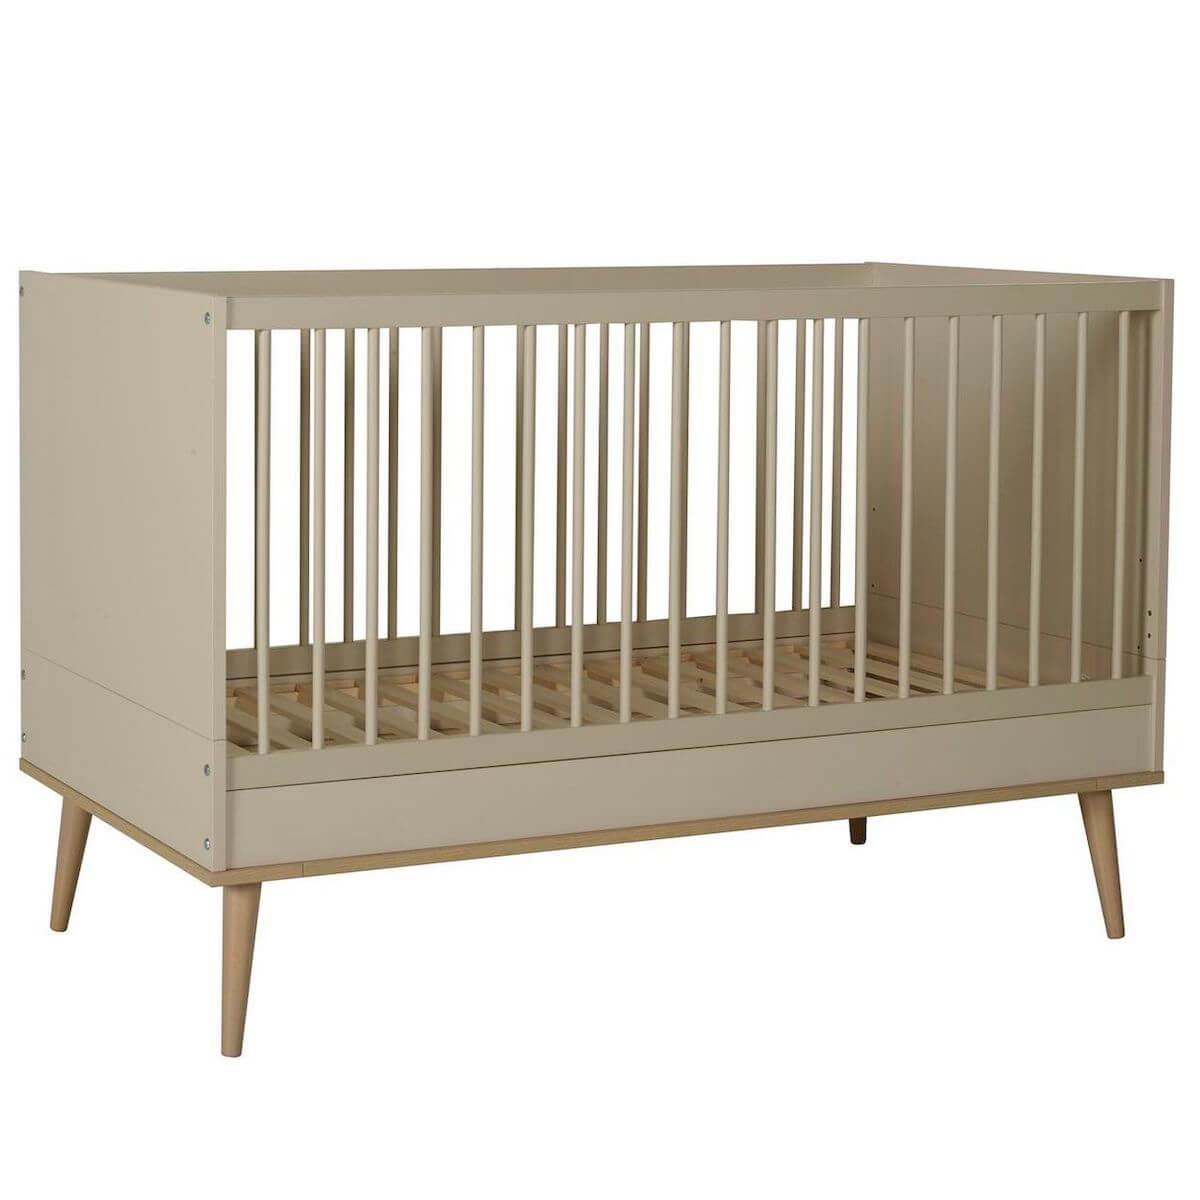 Babybett mitwachsend 70x140cm FLOW Quax Chêne naturel-Clay